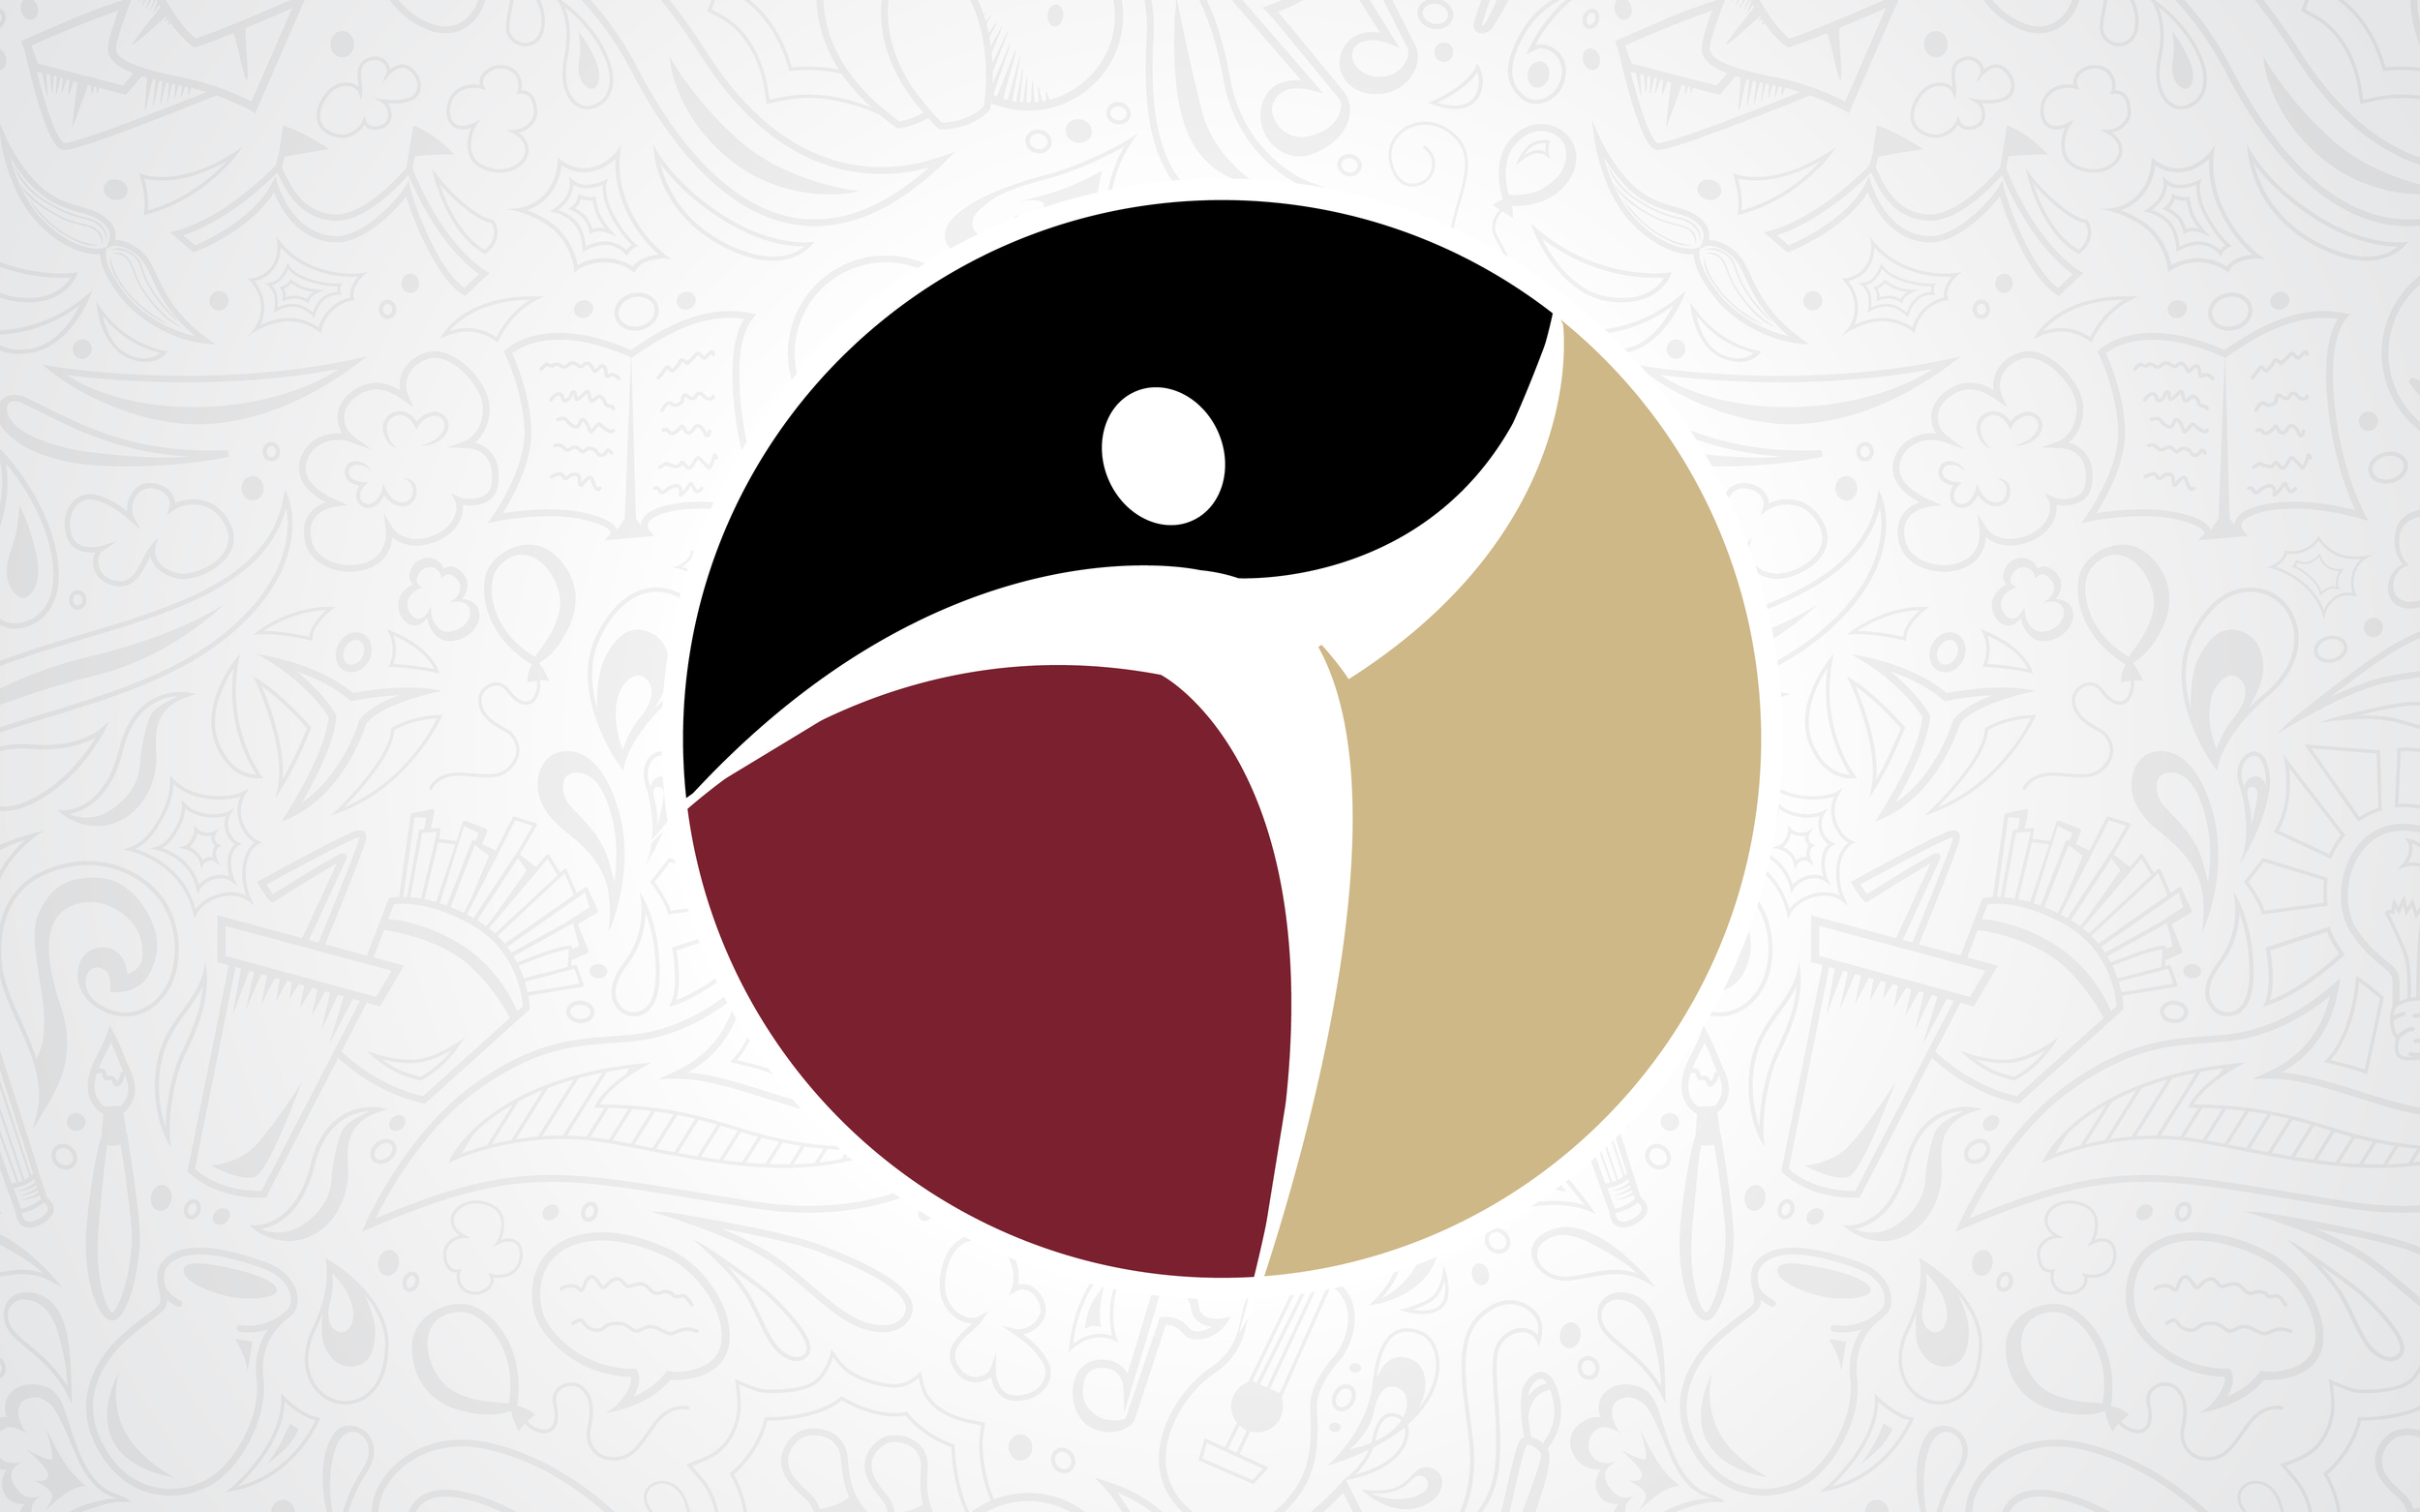 FSU Oglesby Union Brand Identity